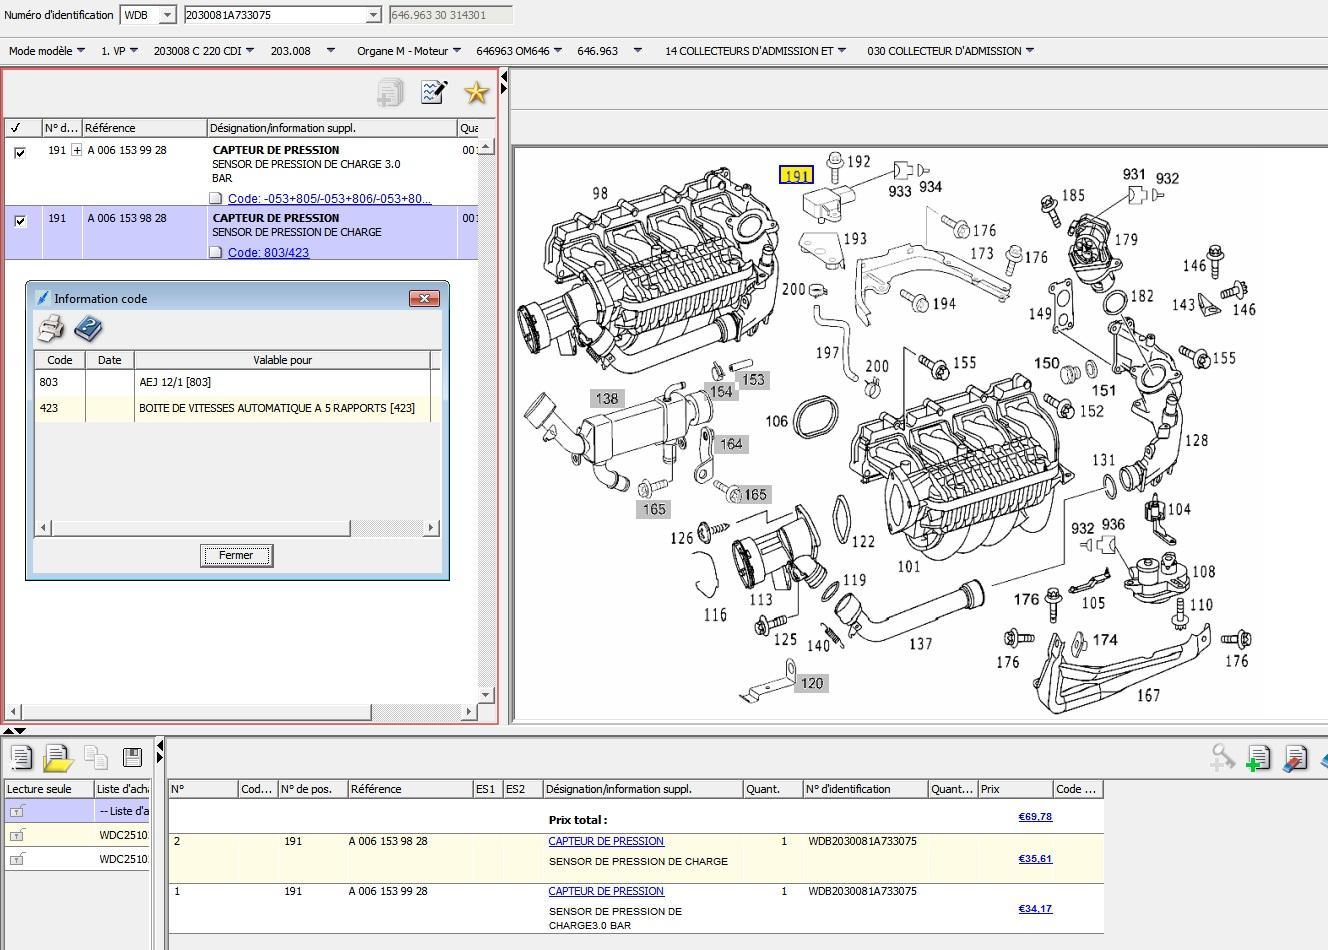 Capteur-de-pression-WDB2030081A733075.jpeg